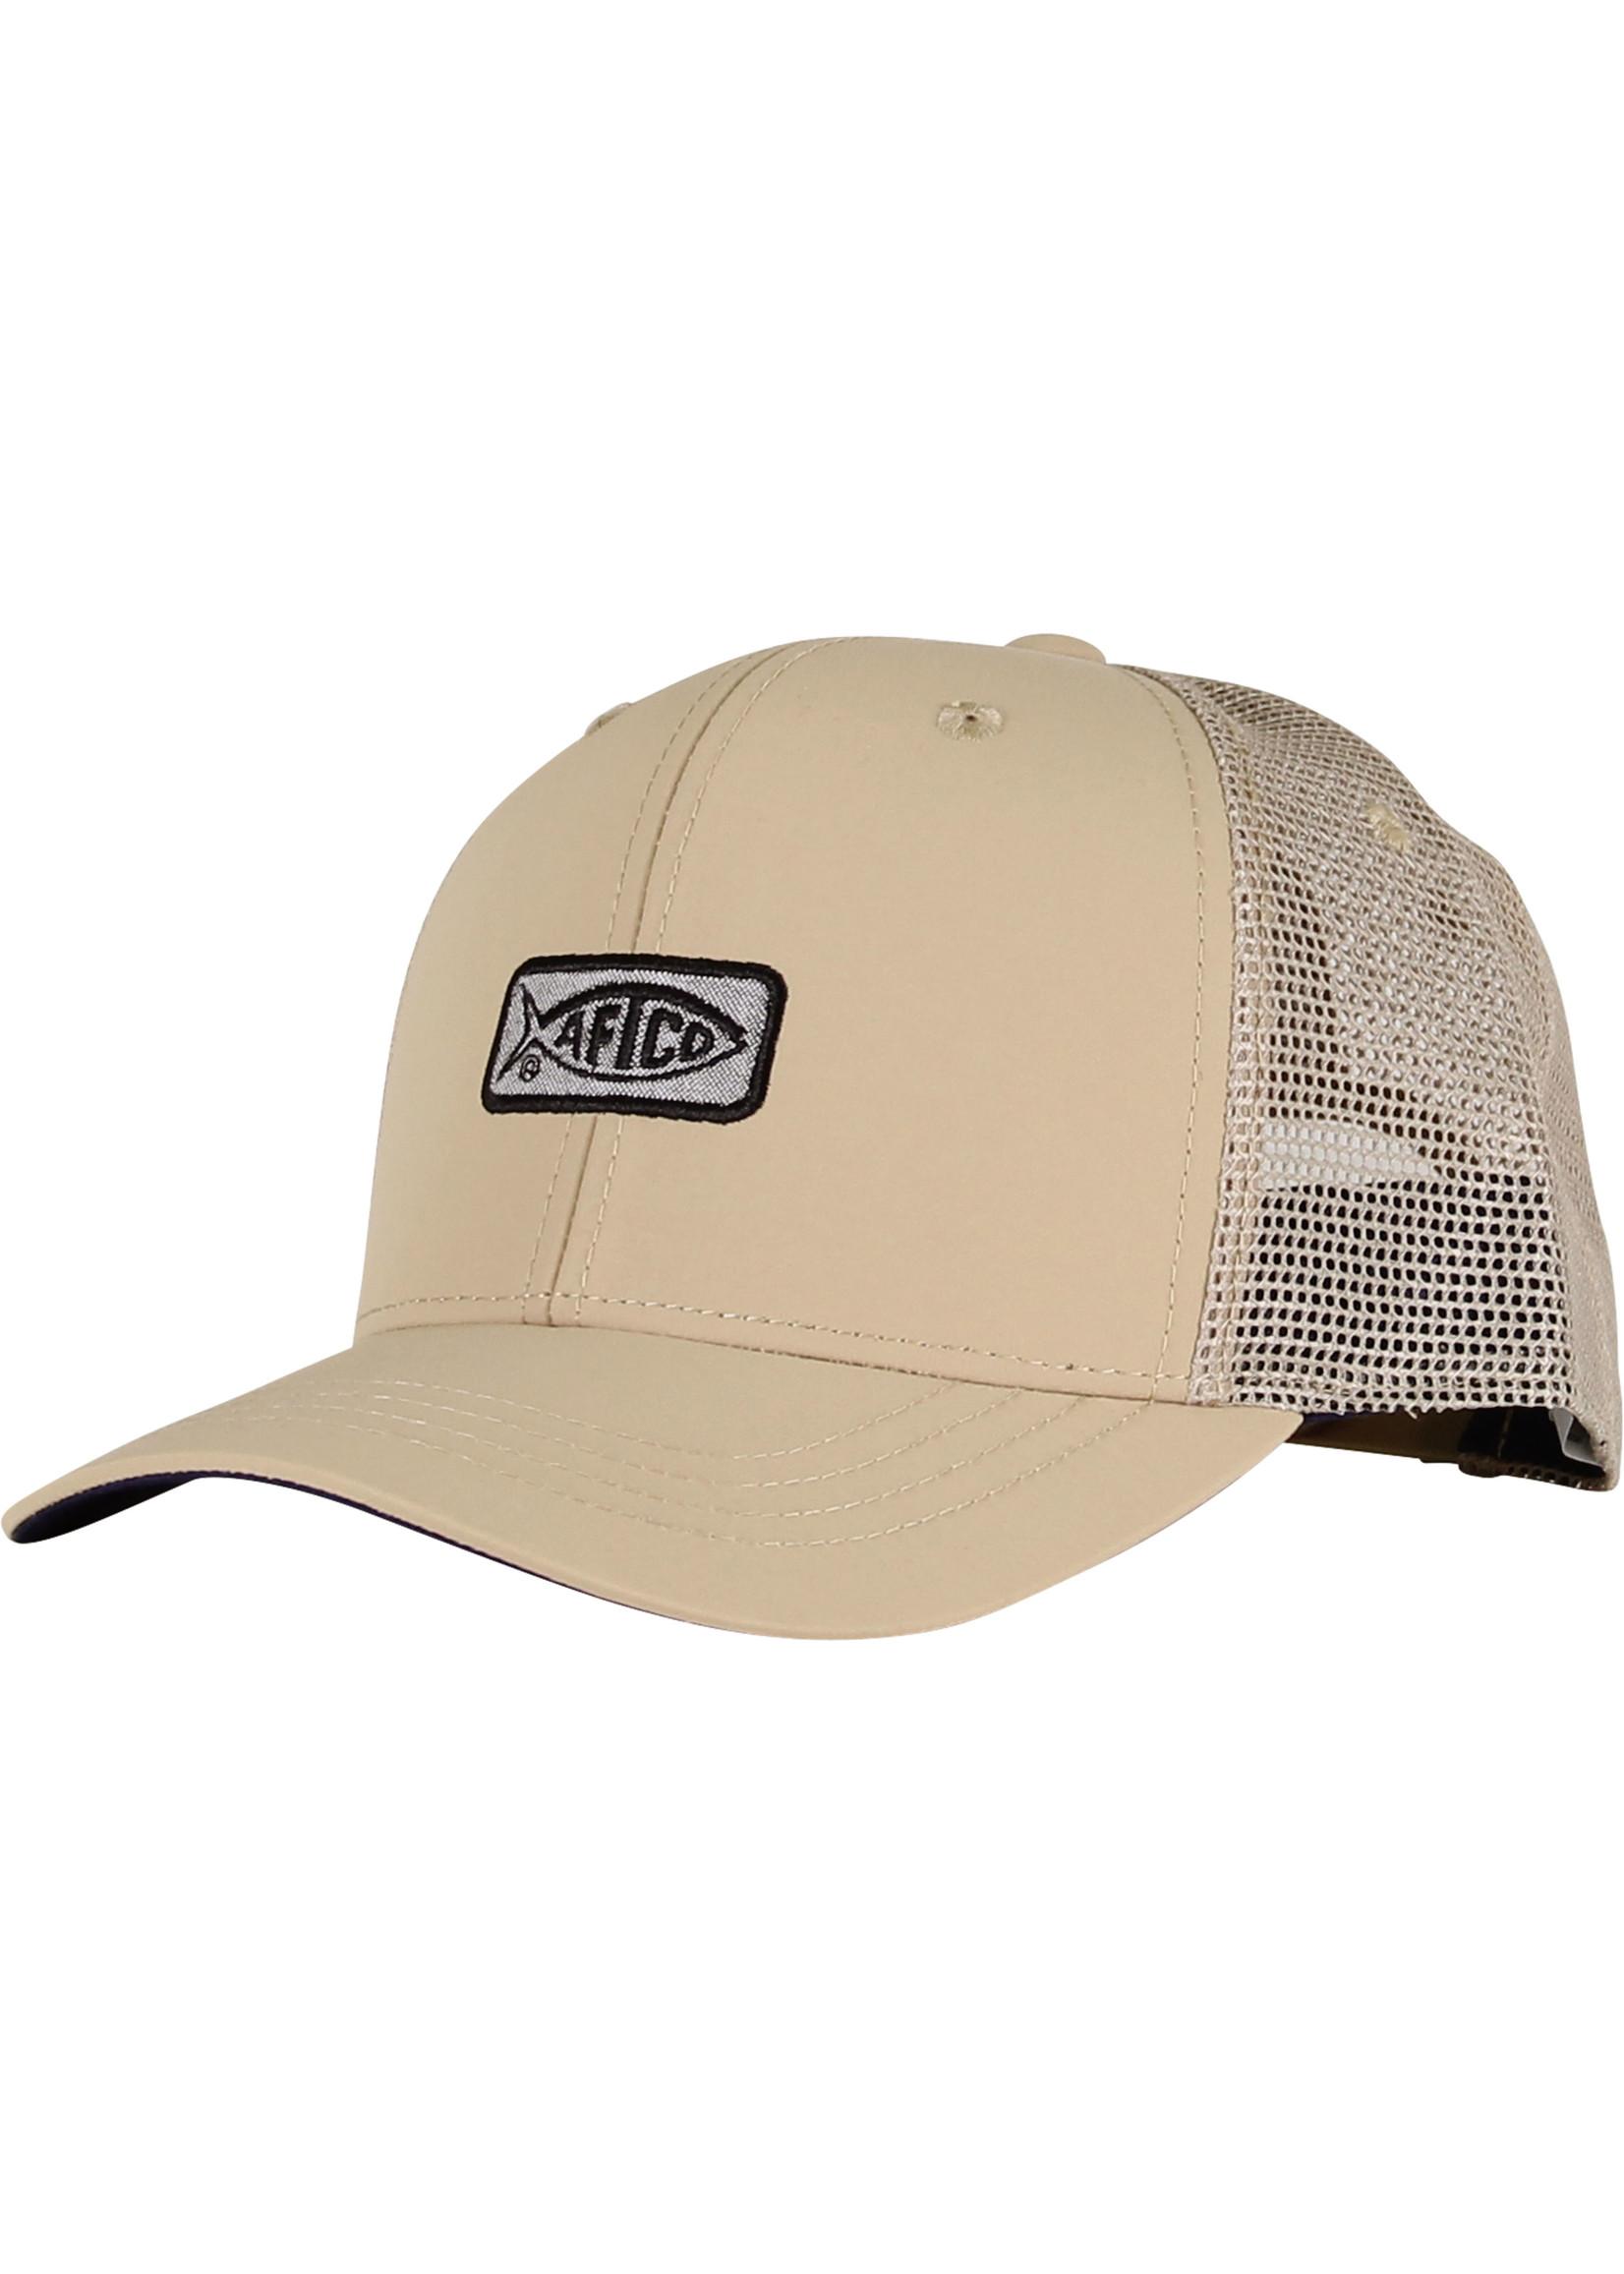 AFTCO Original Fishing Trucker Hat